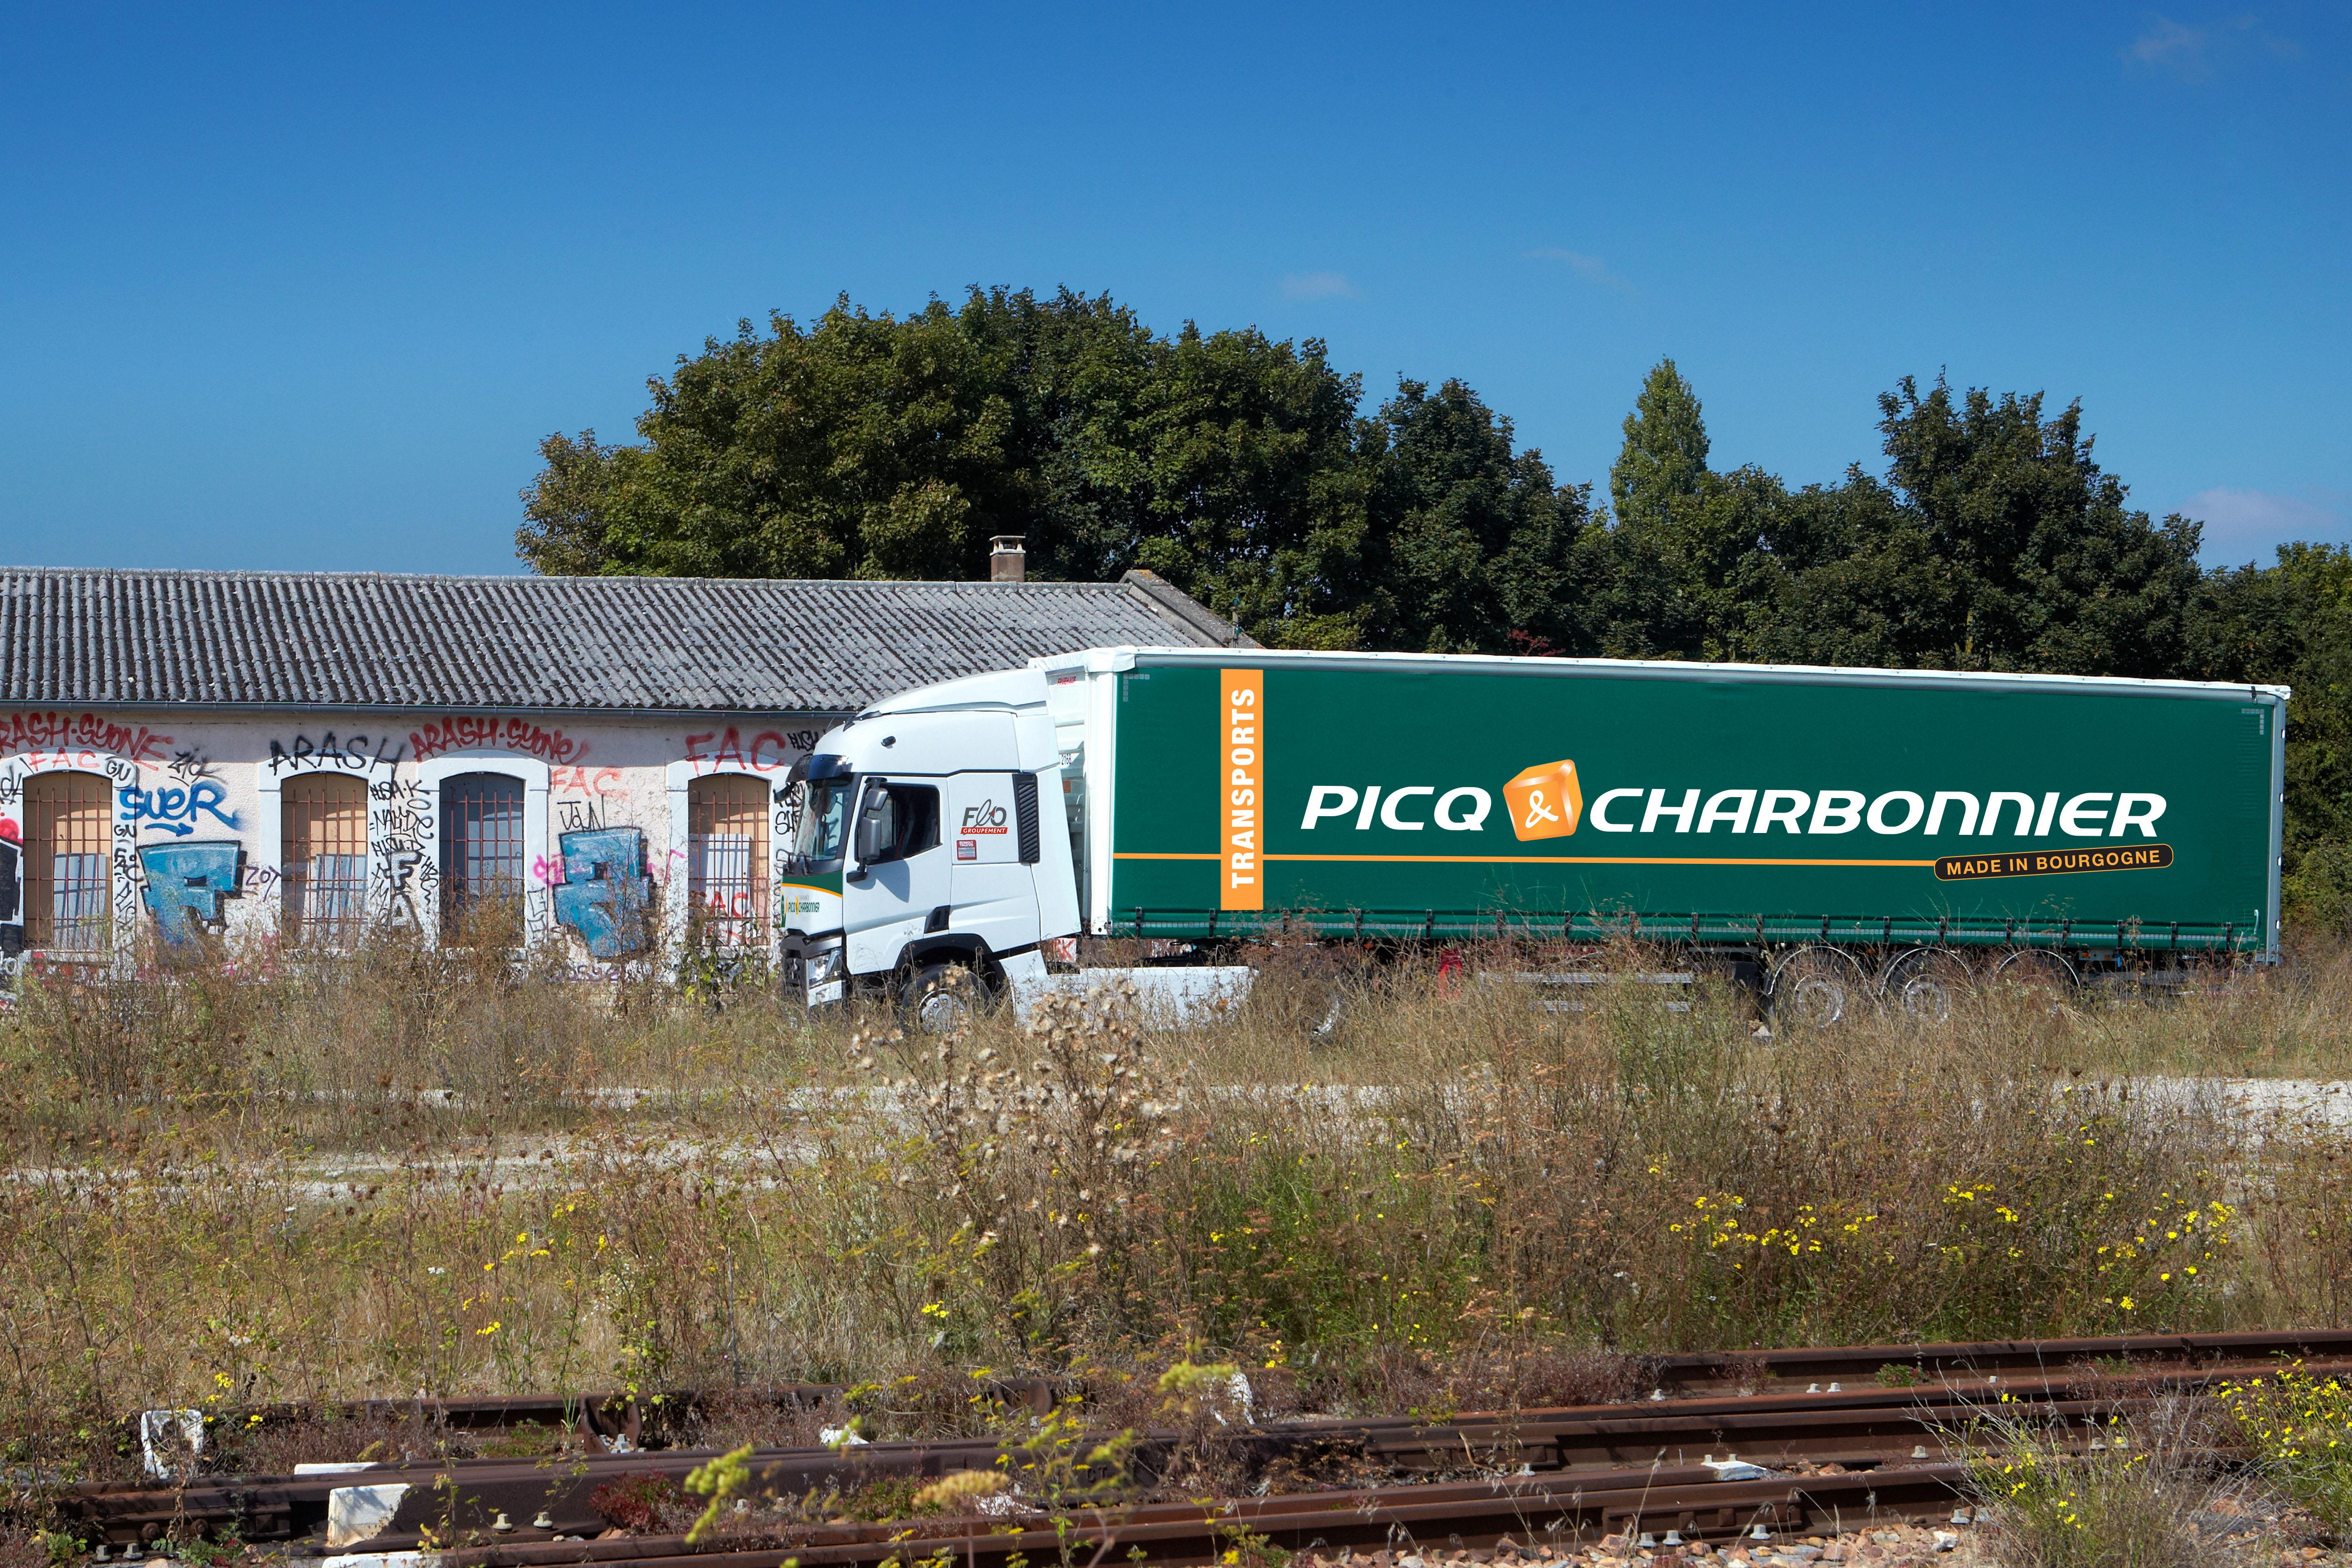 Ensemble Picq & Charbonnier